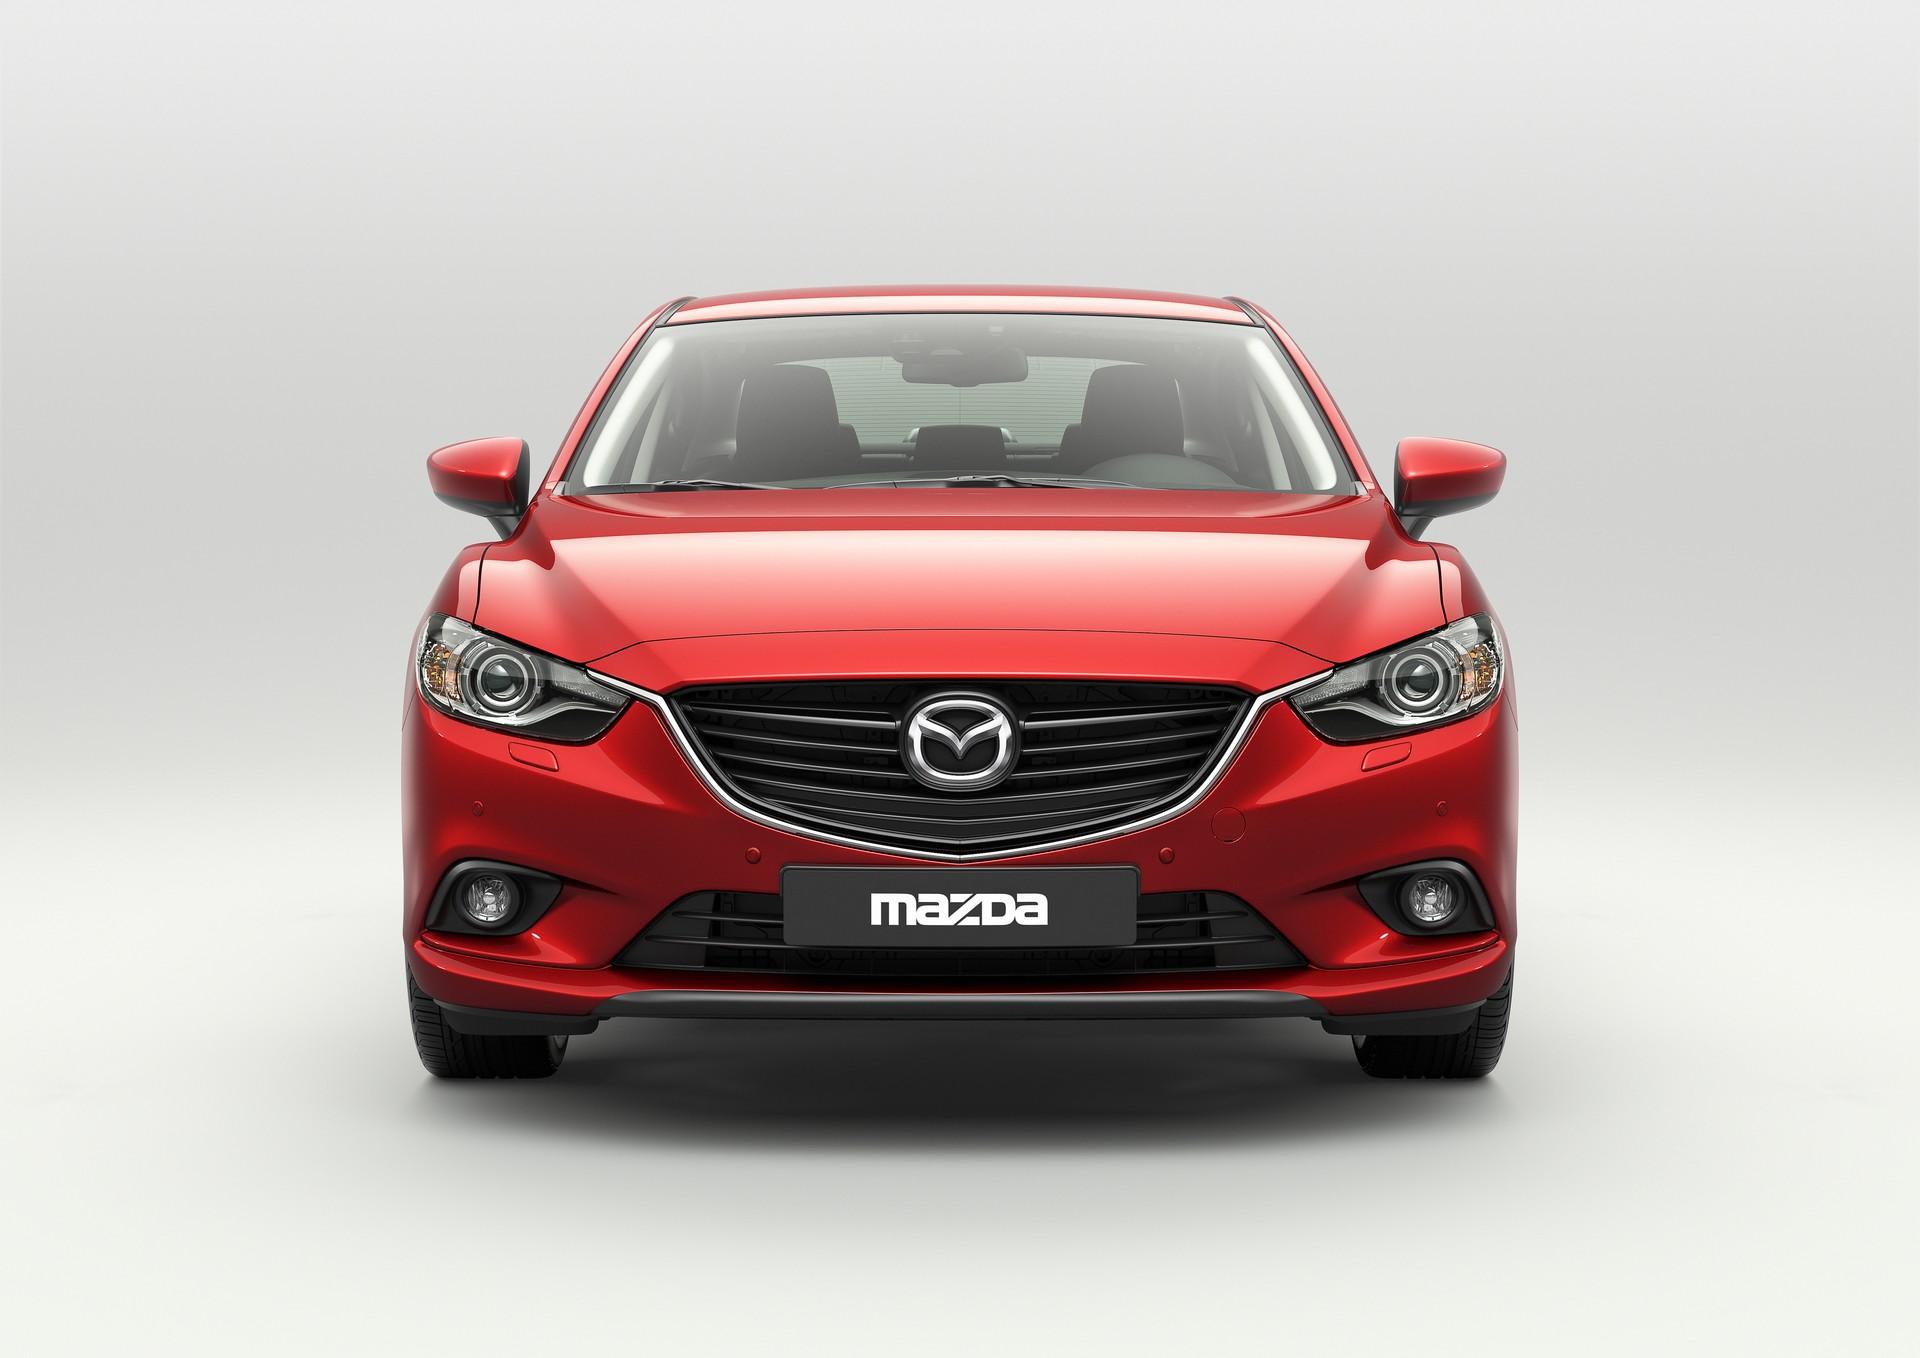 Mazda Recall: 2014 Mazda3, 2014-2015 Mazda6 - Automotive.com